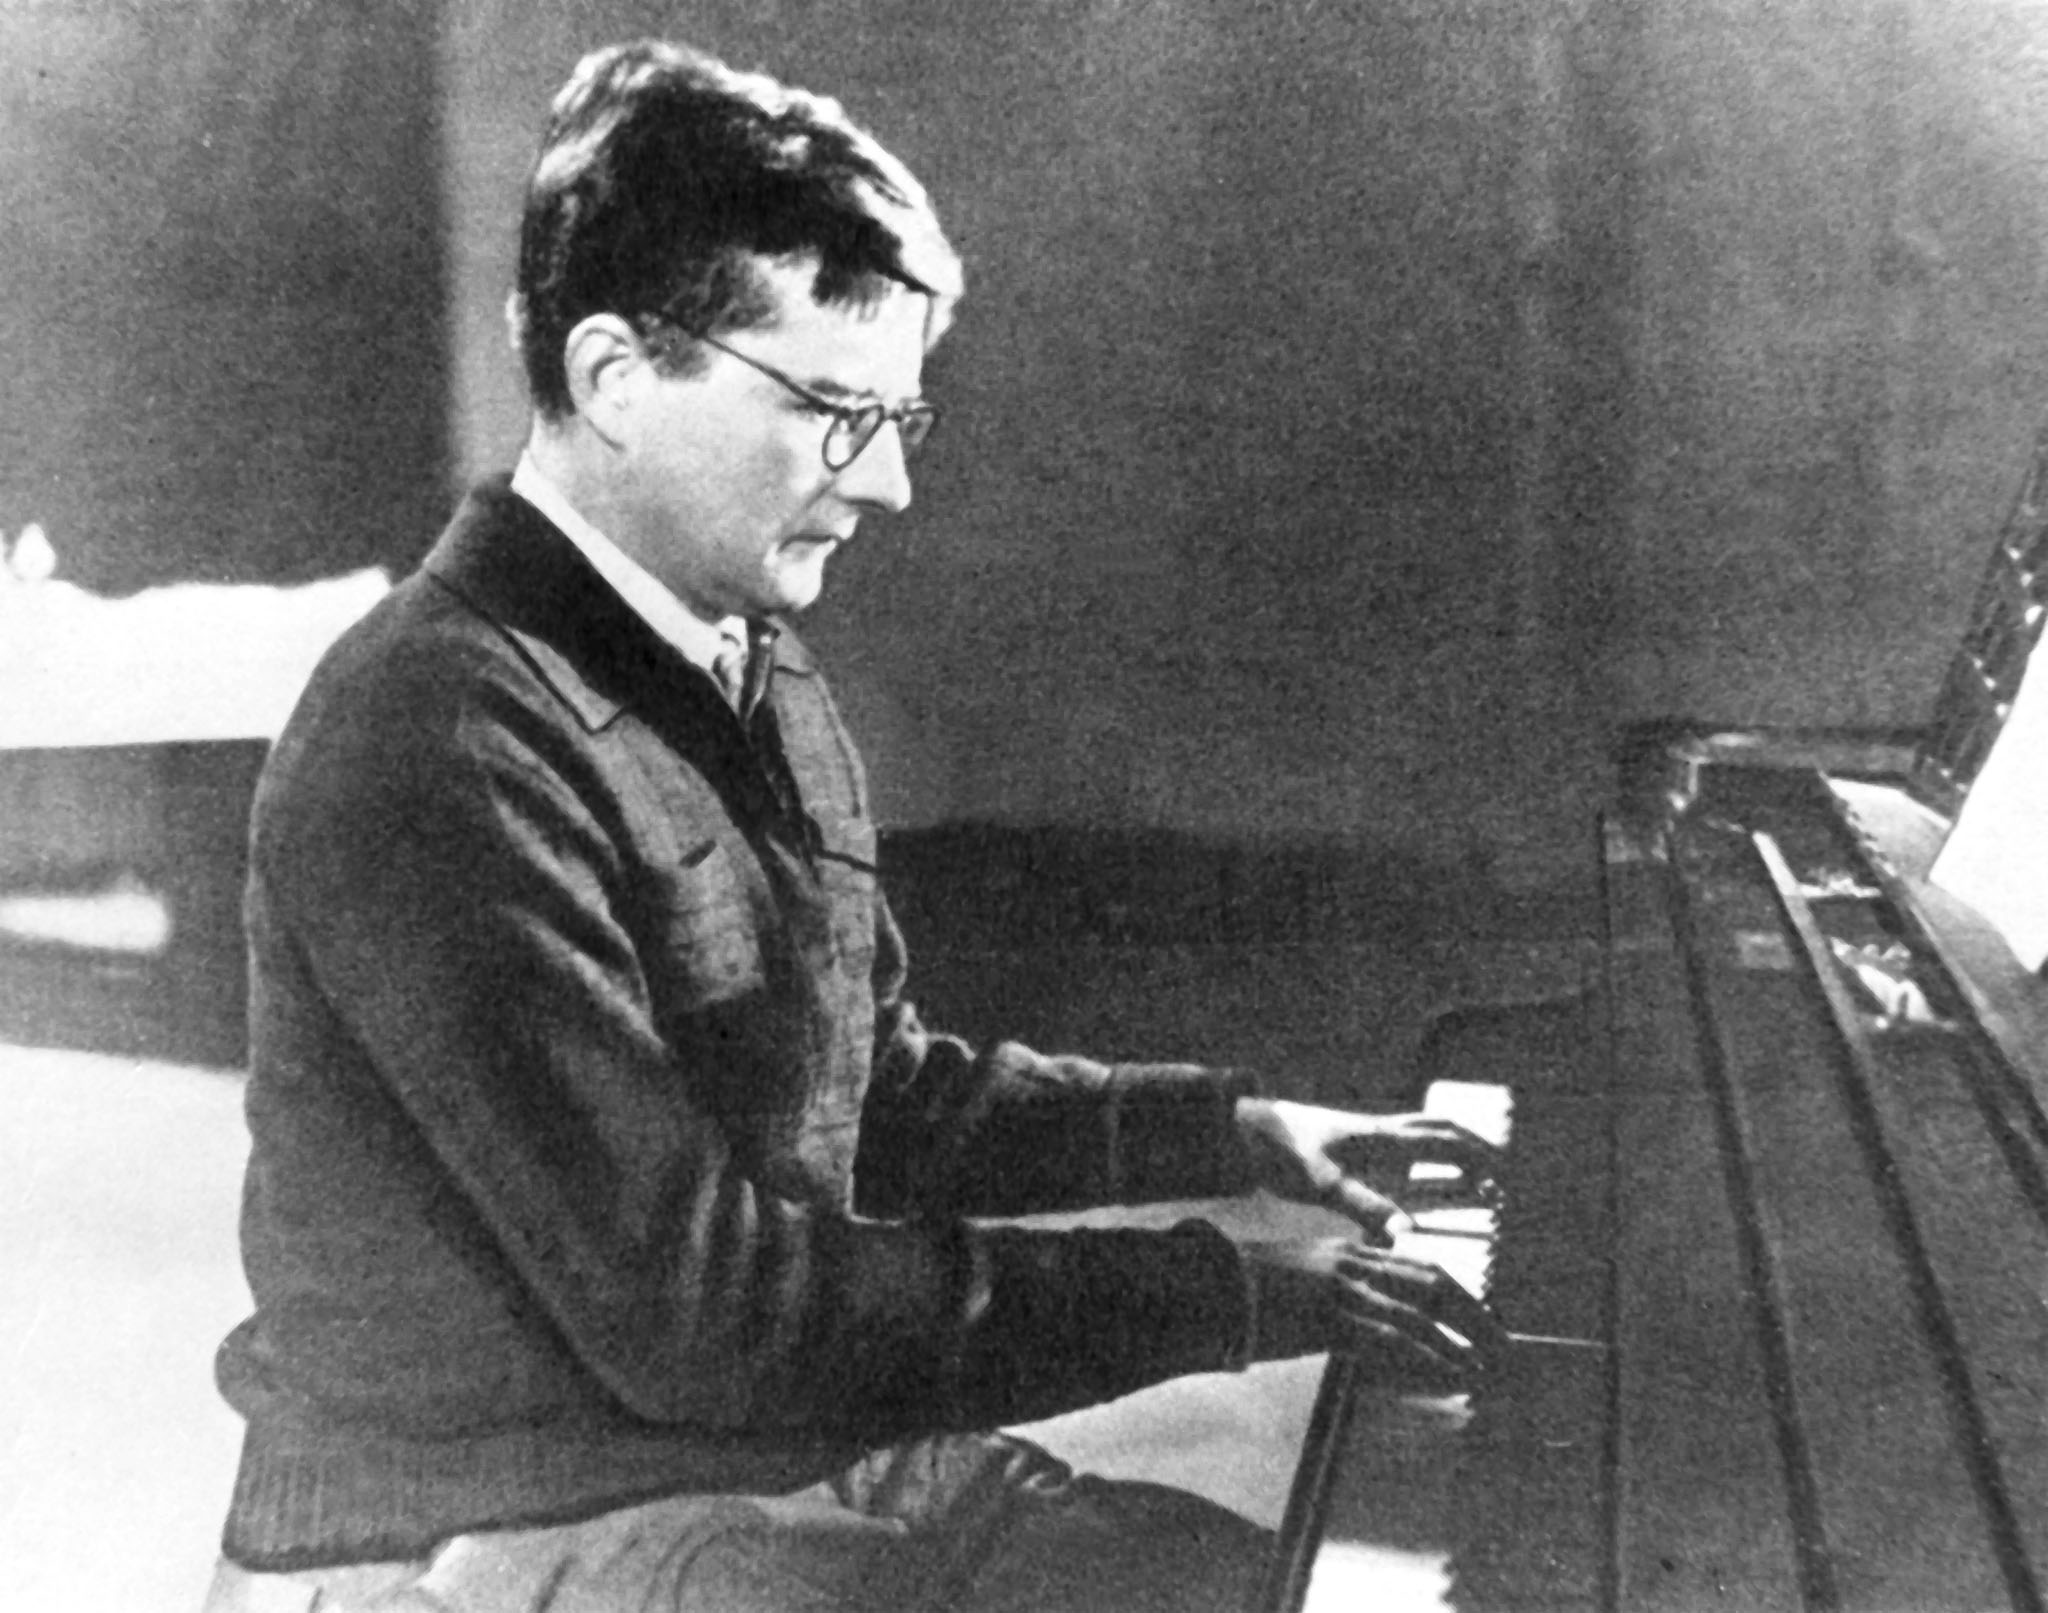 Дмитрий Шостакович, 1941 год